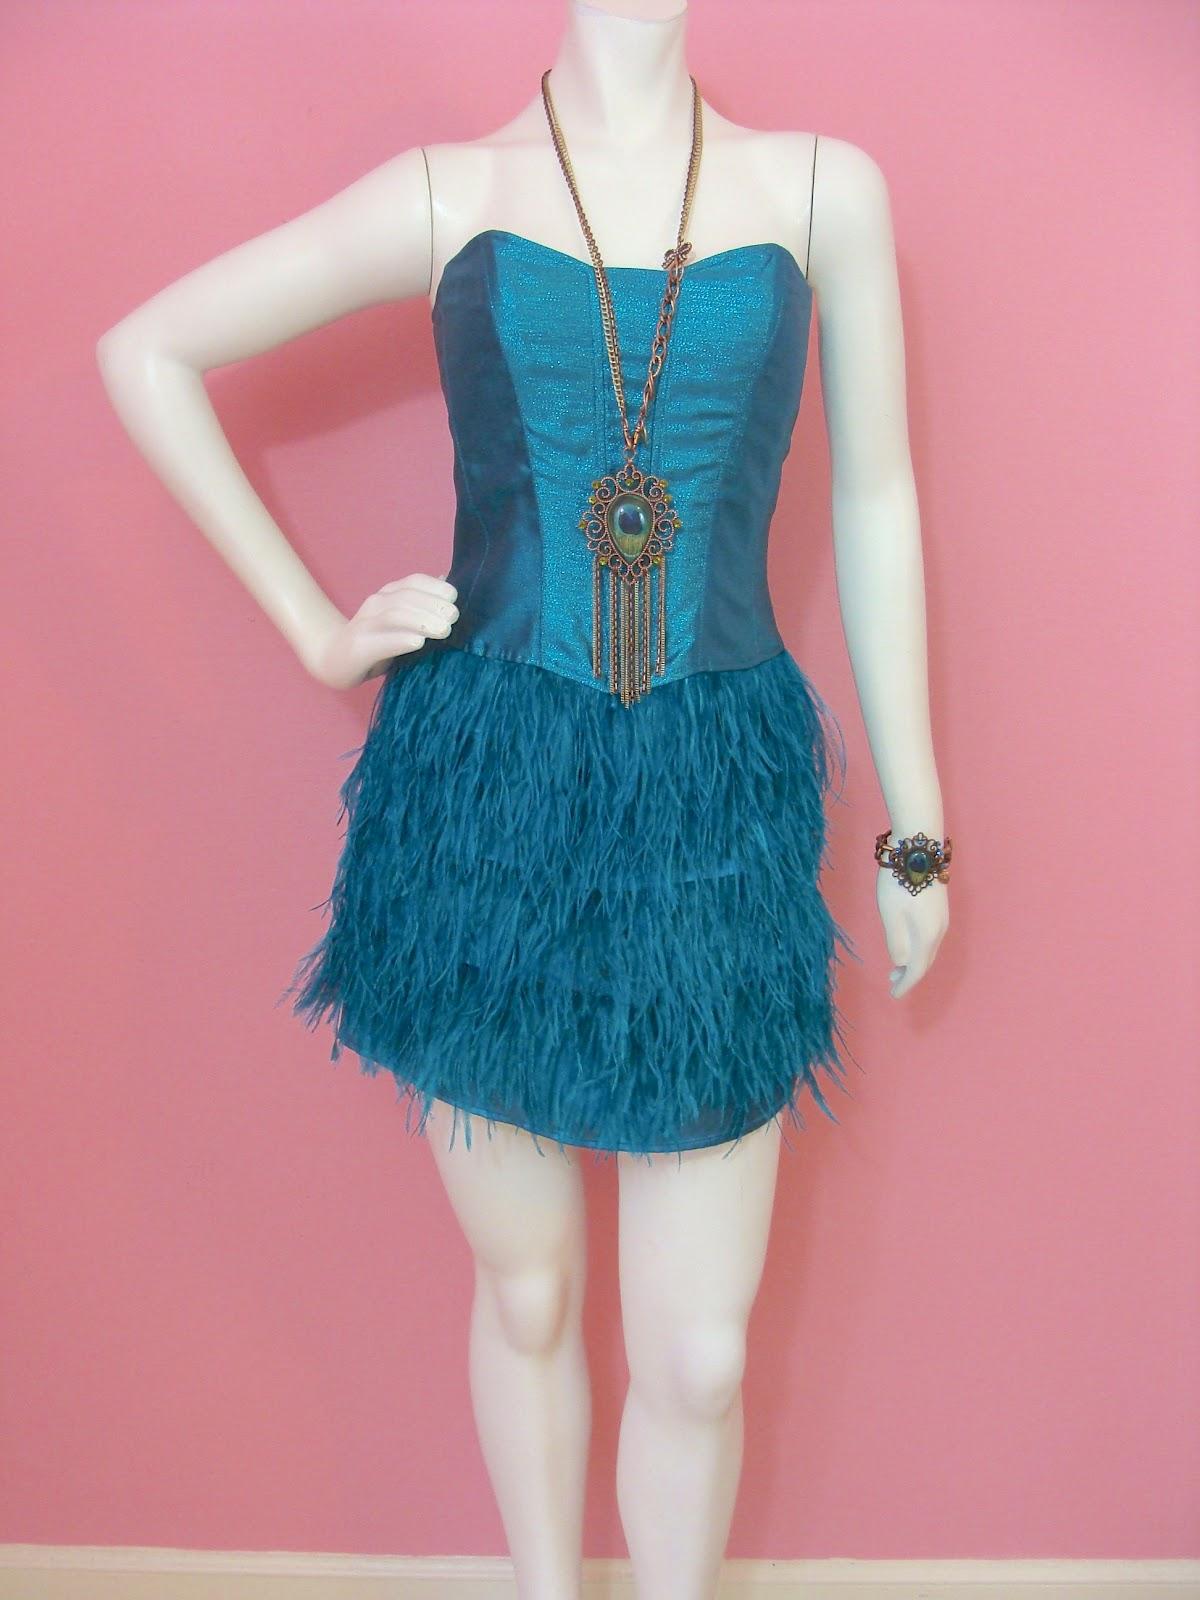 Sunny Beach Couture Fashion Blog: Betsey Johnson KAWAII STRAPLESS ...